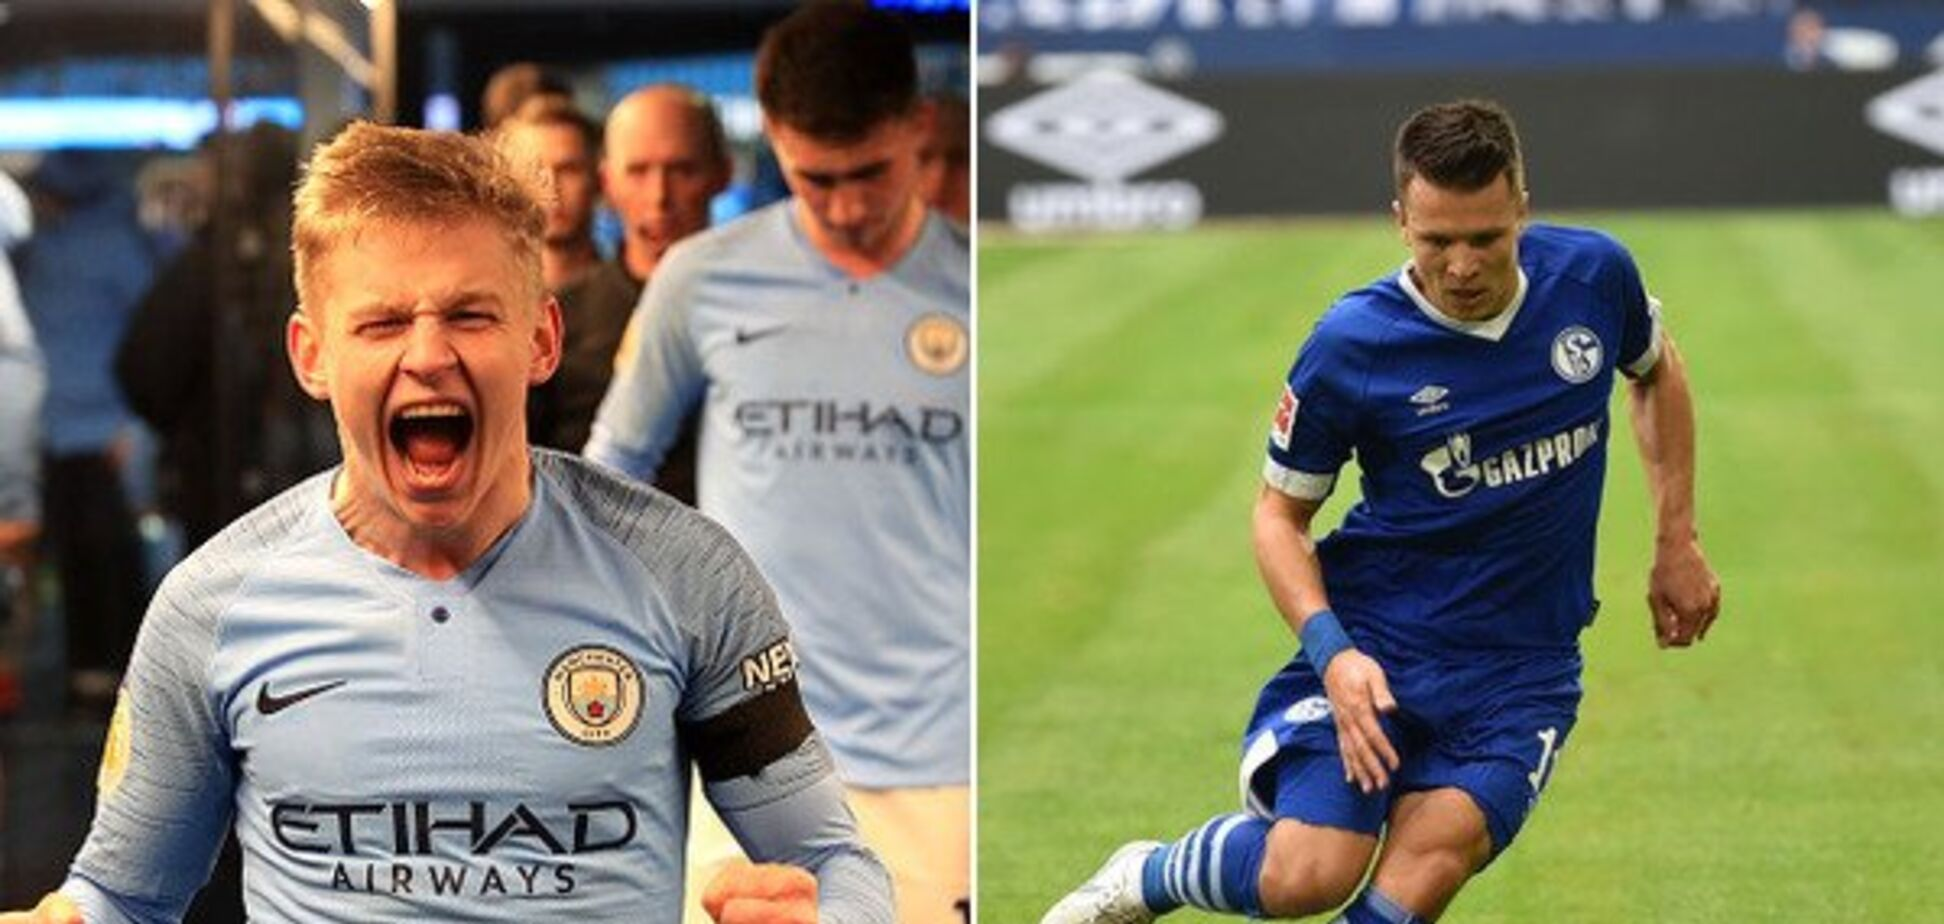 Шальке – Манчестер Сити: прогноз на матч 1/8 финала Лиги чемпионов